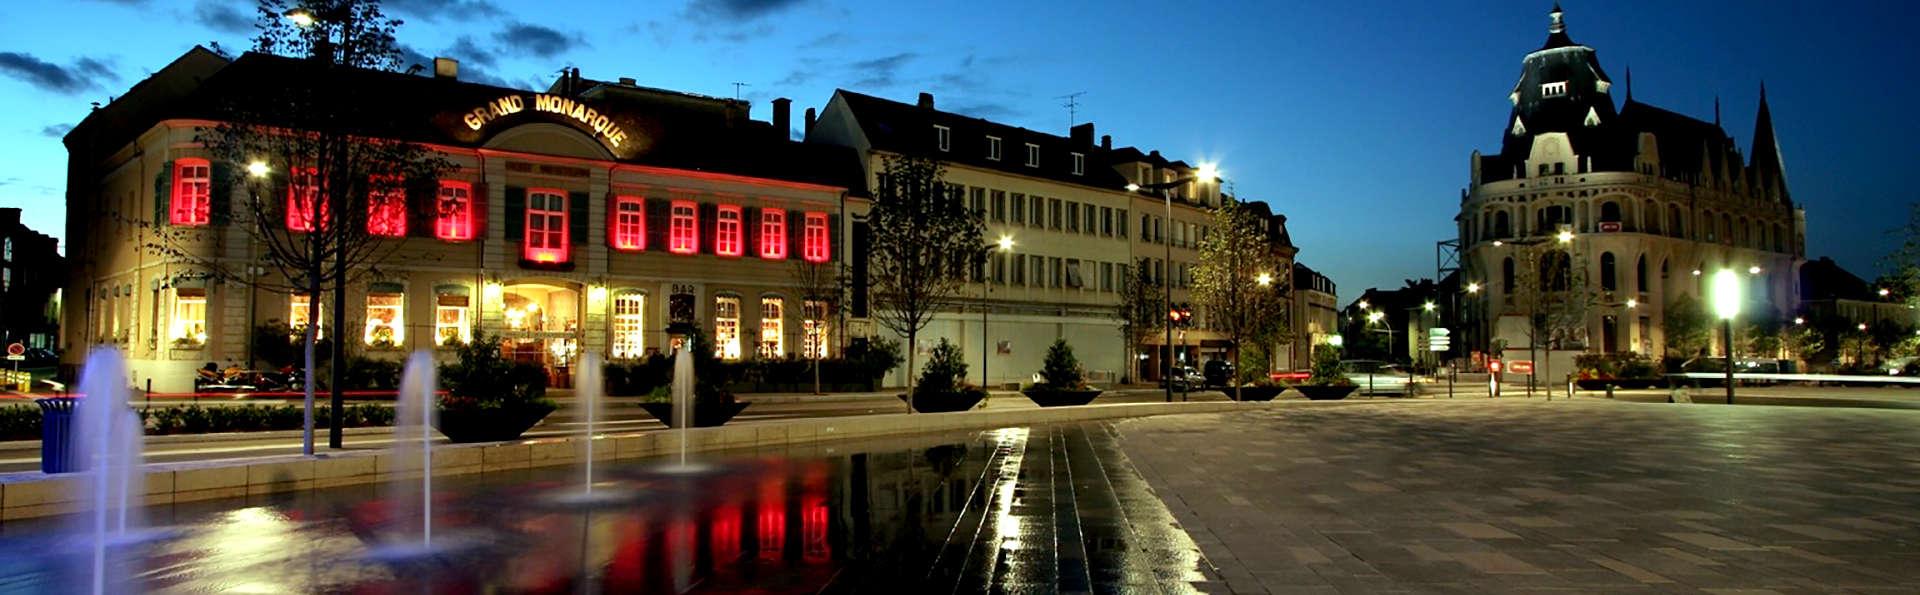 Le Grand Monarque - Chartres - Edit_Front.jpg